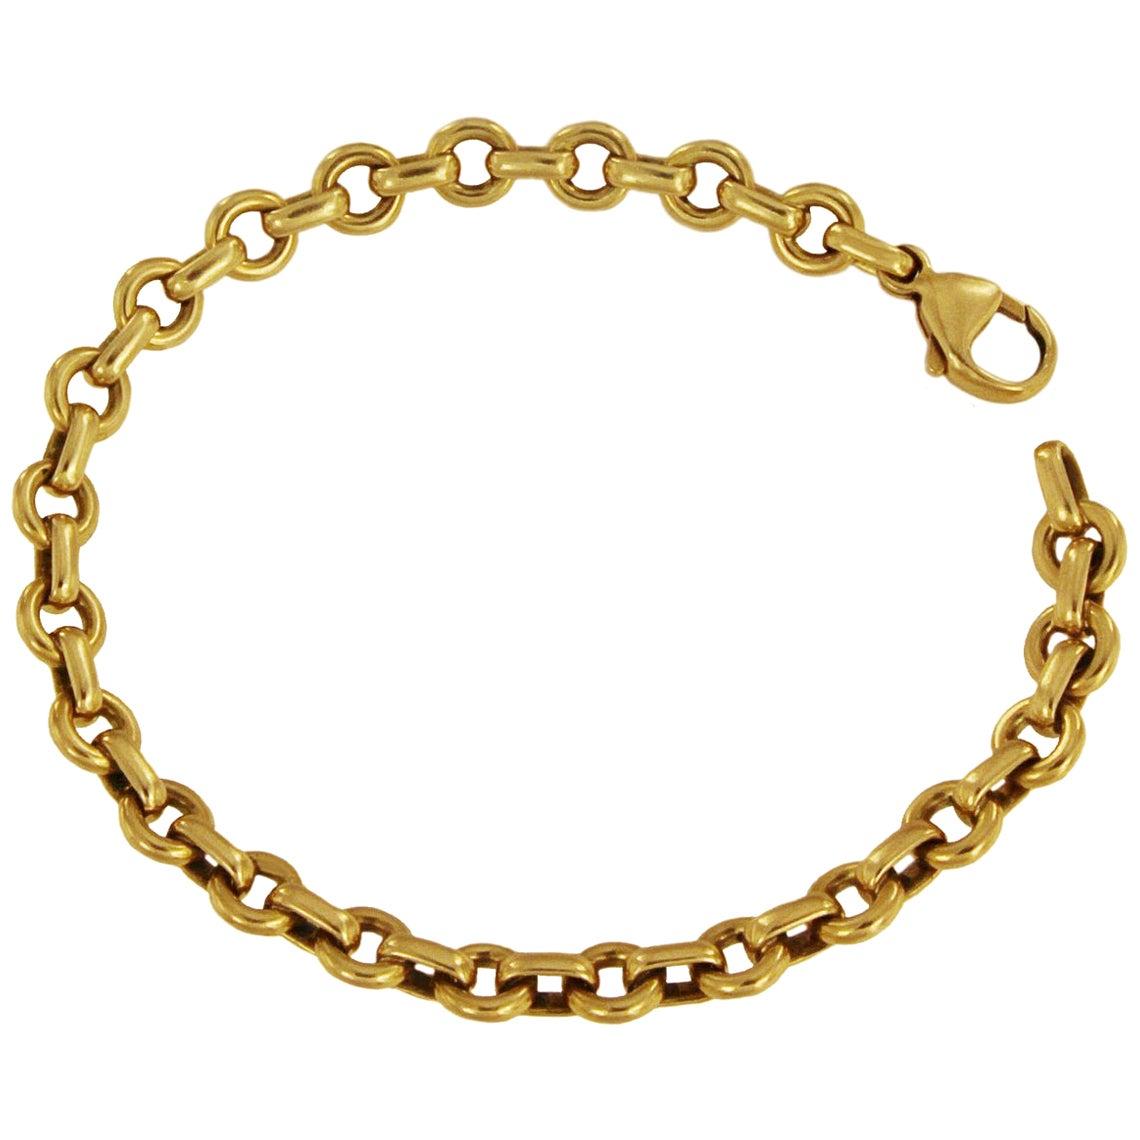 Tiffany & Co. 18 Karat Yellow Gold Round Chain Link Bracelet